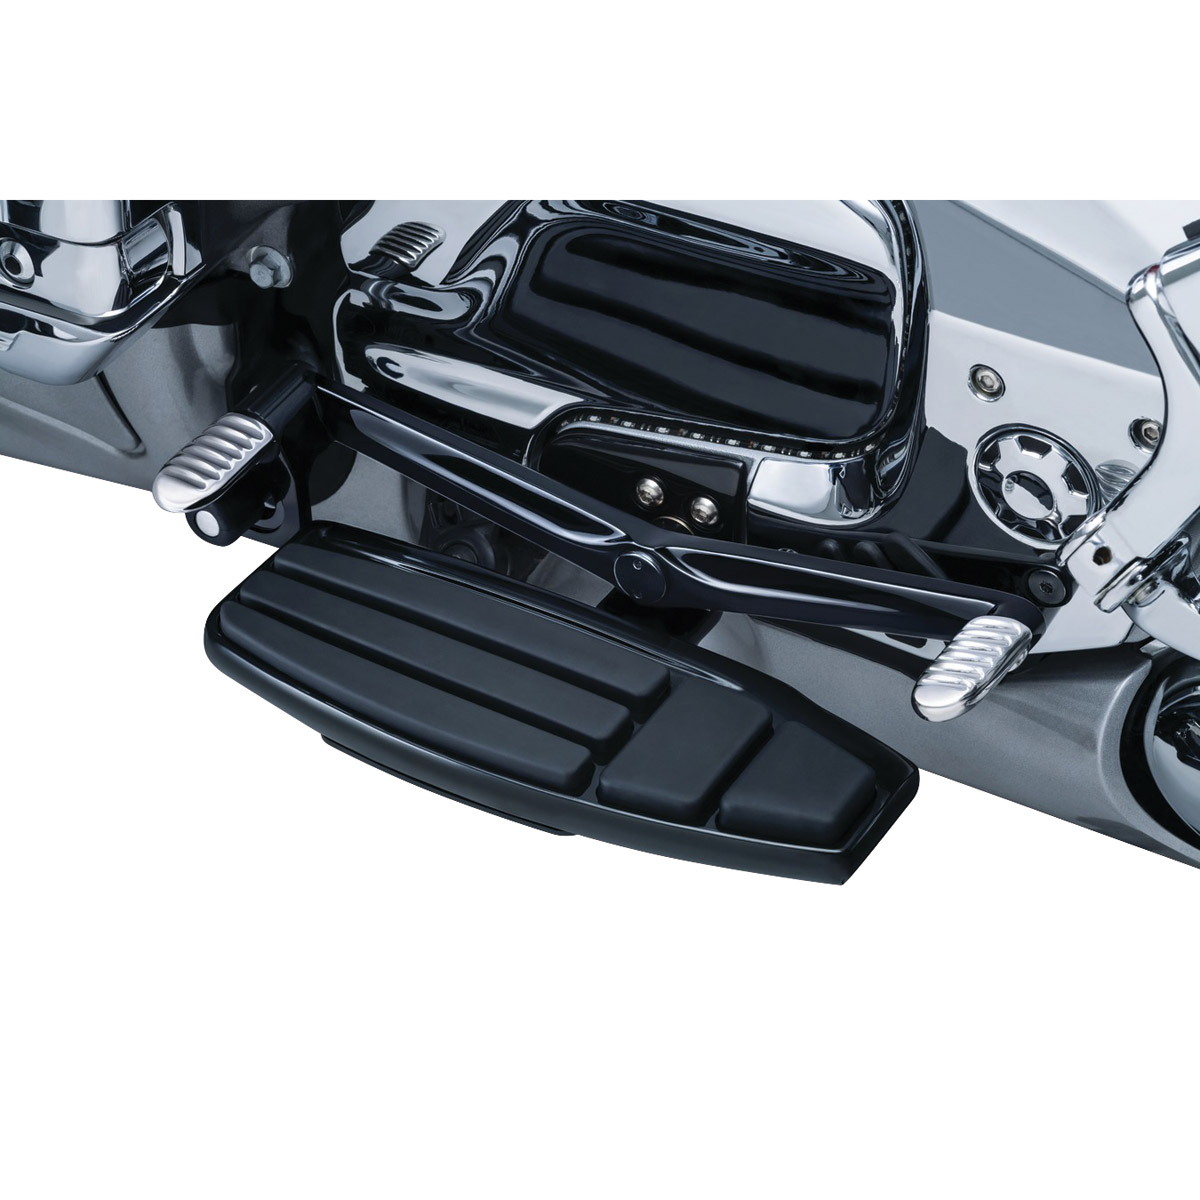 Kuryakyn Gloss Black Driver Floorboard Kit